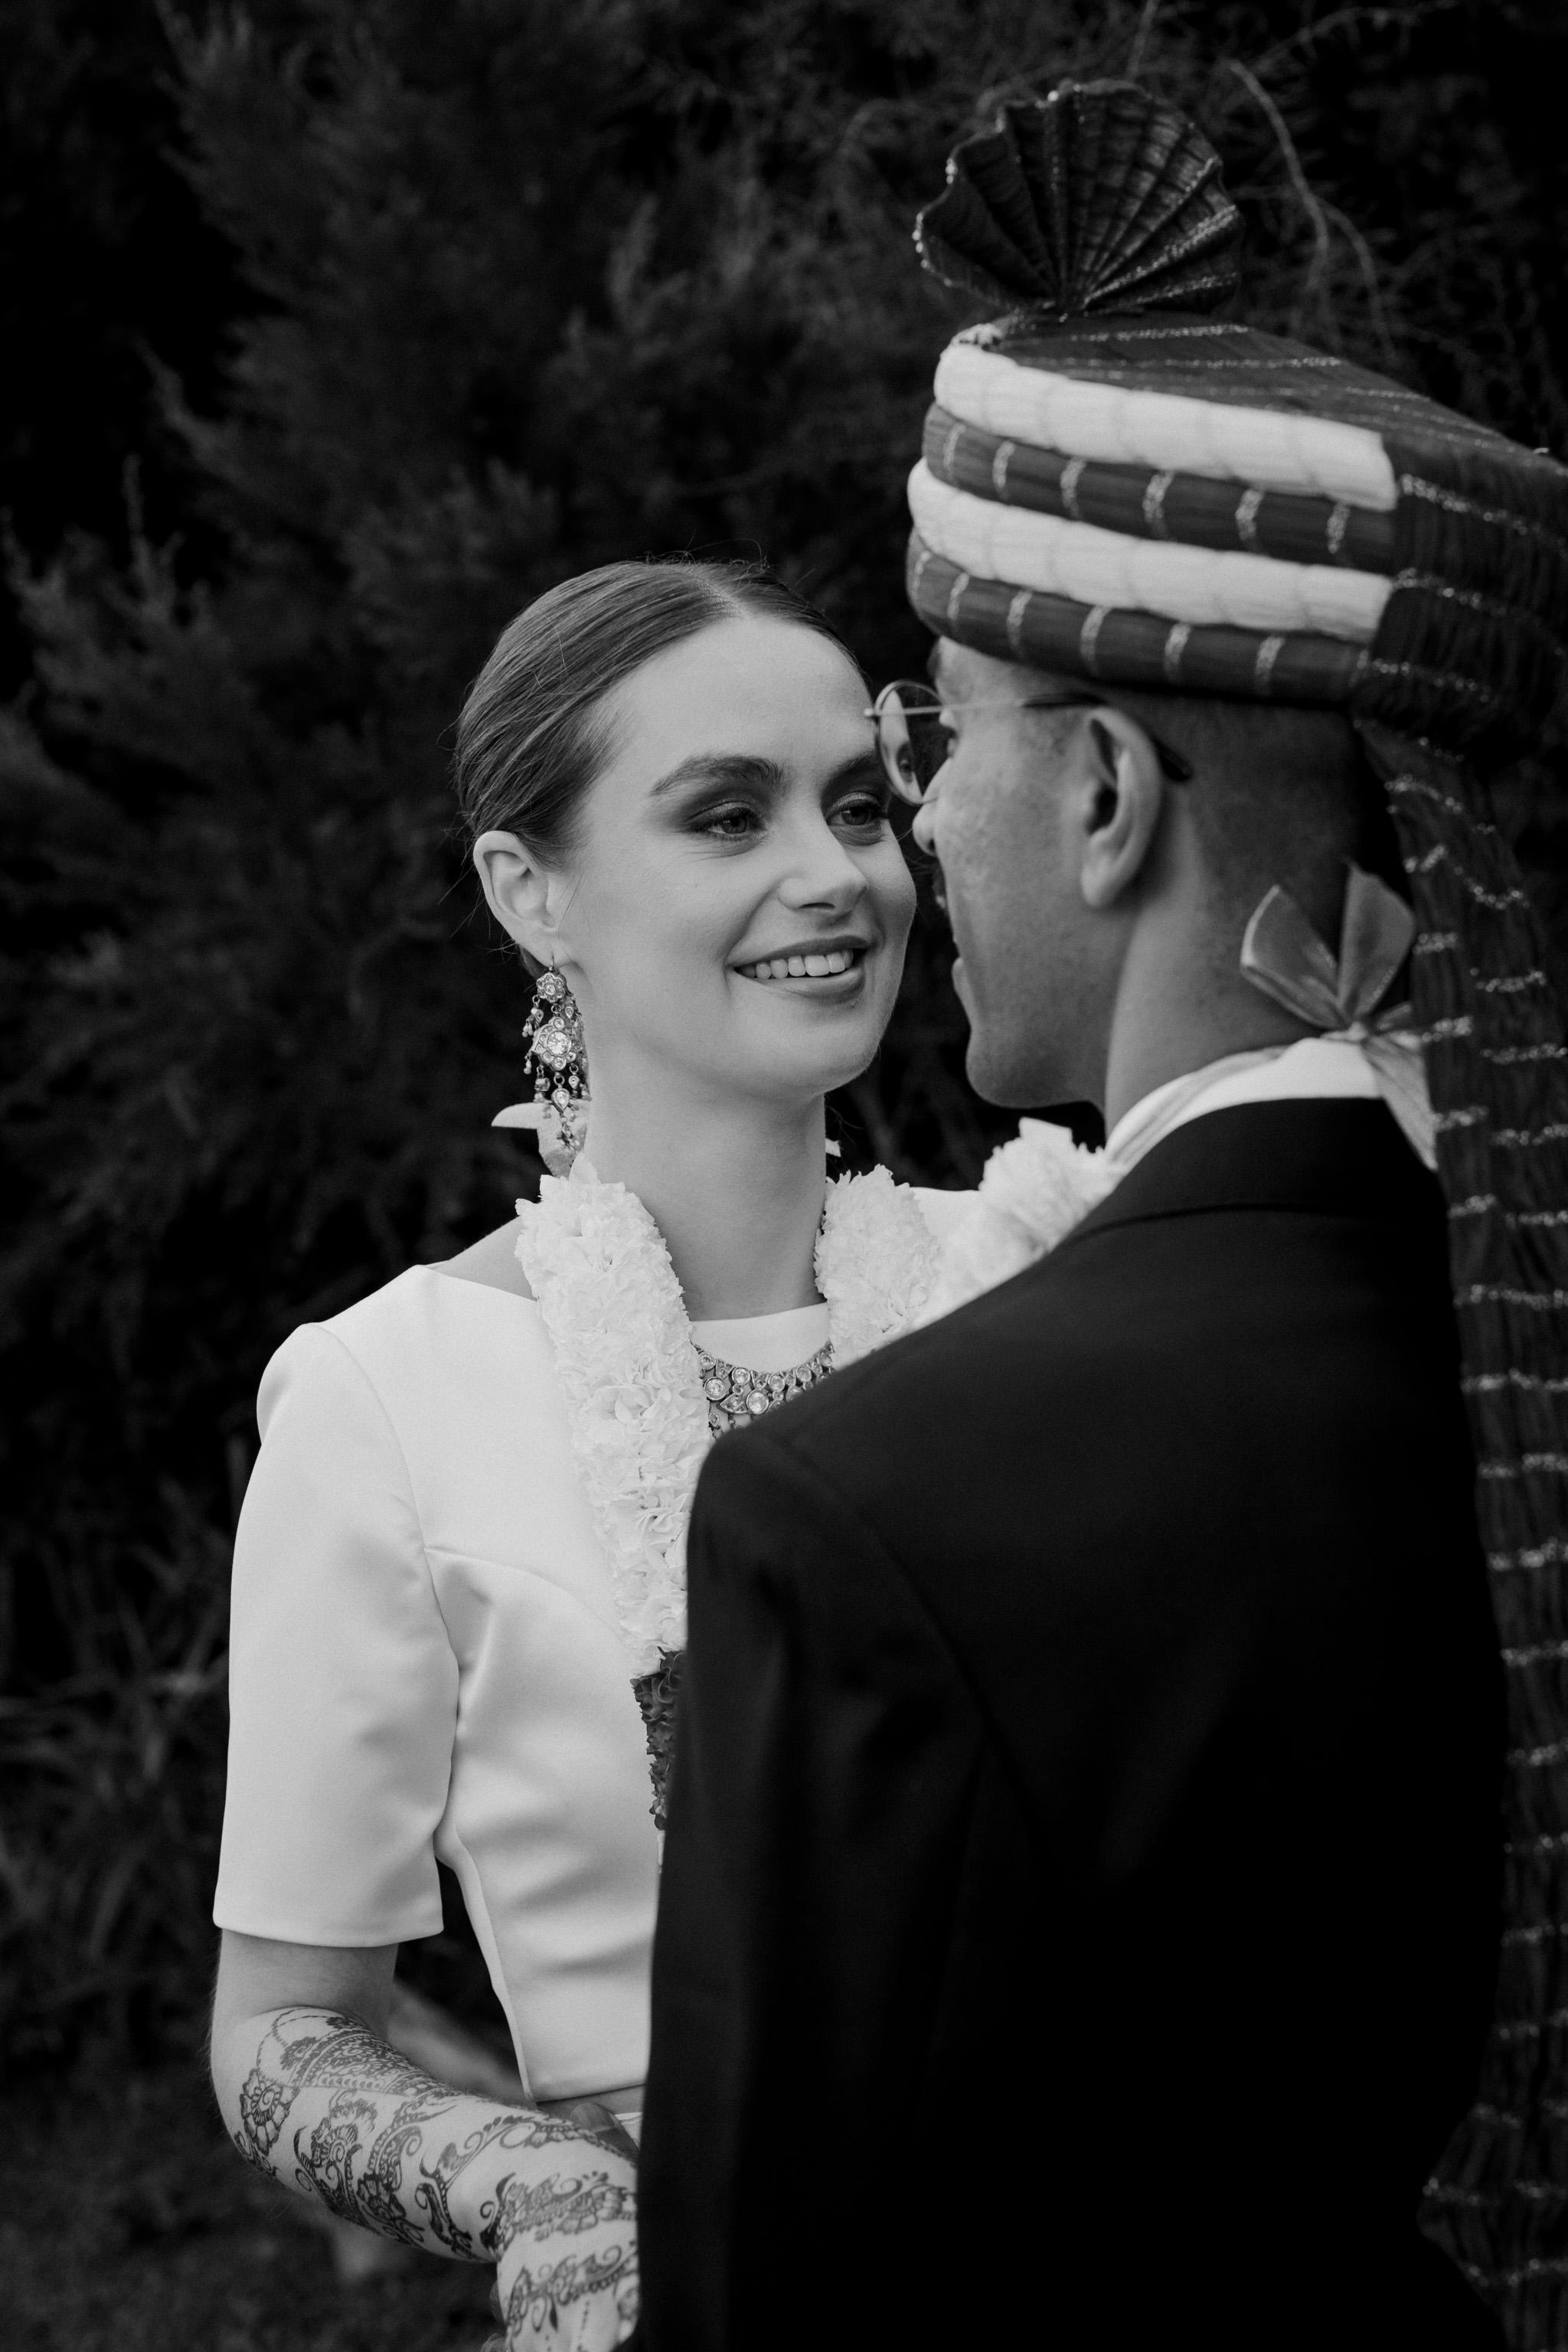 Amelia+Ani_Wedding_May2019_credit_OneDaySomewherePhotography-90.jpg